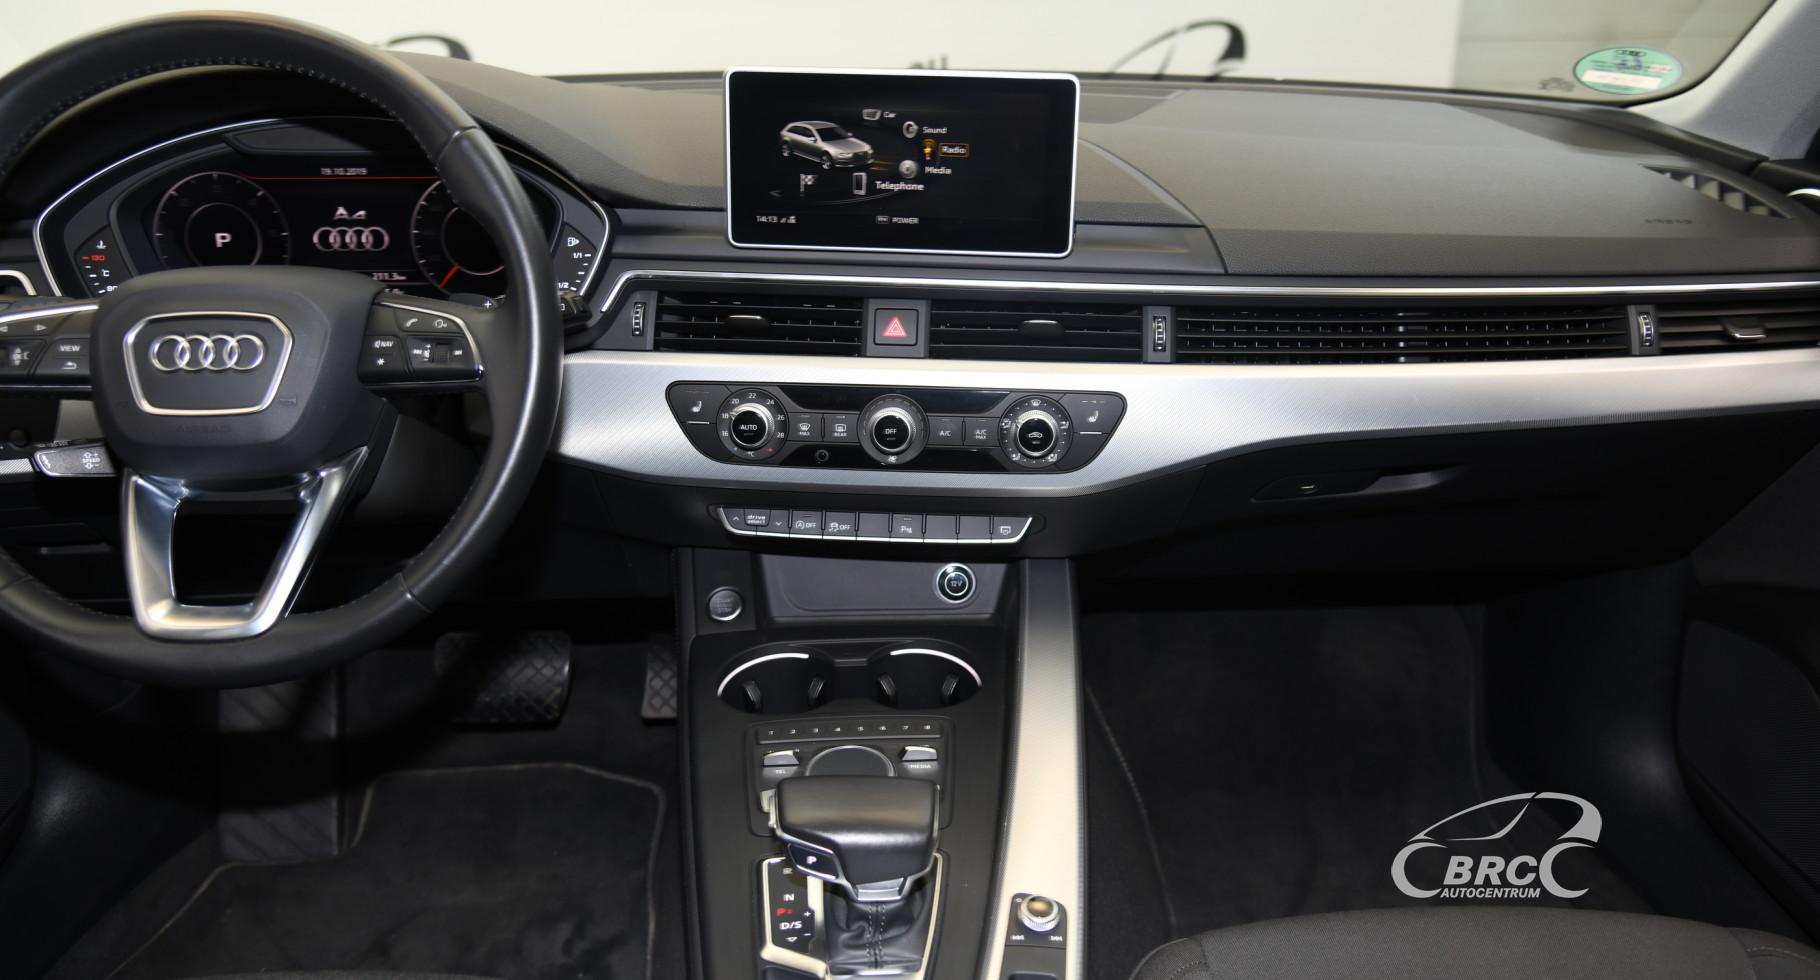 Audi A4 2.0 TDI Avant Automatas